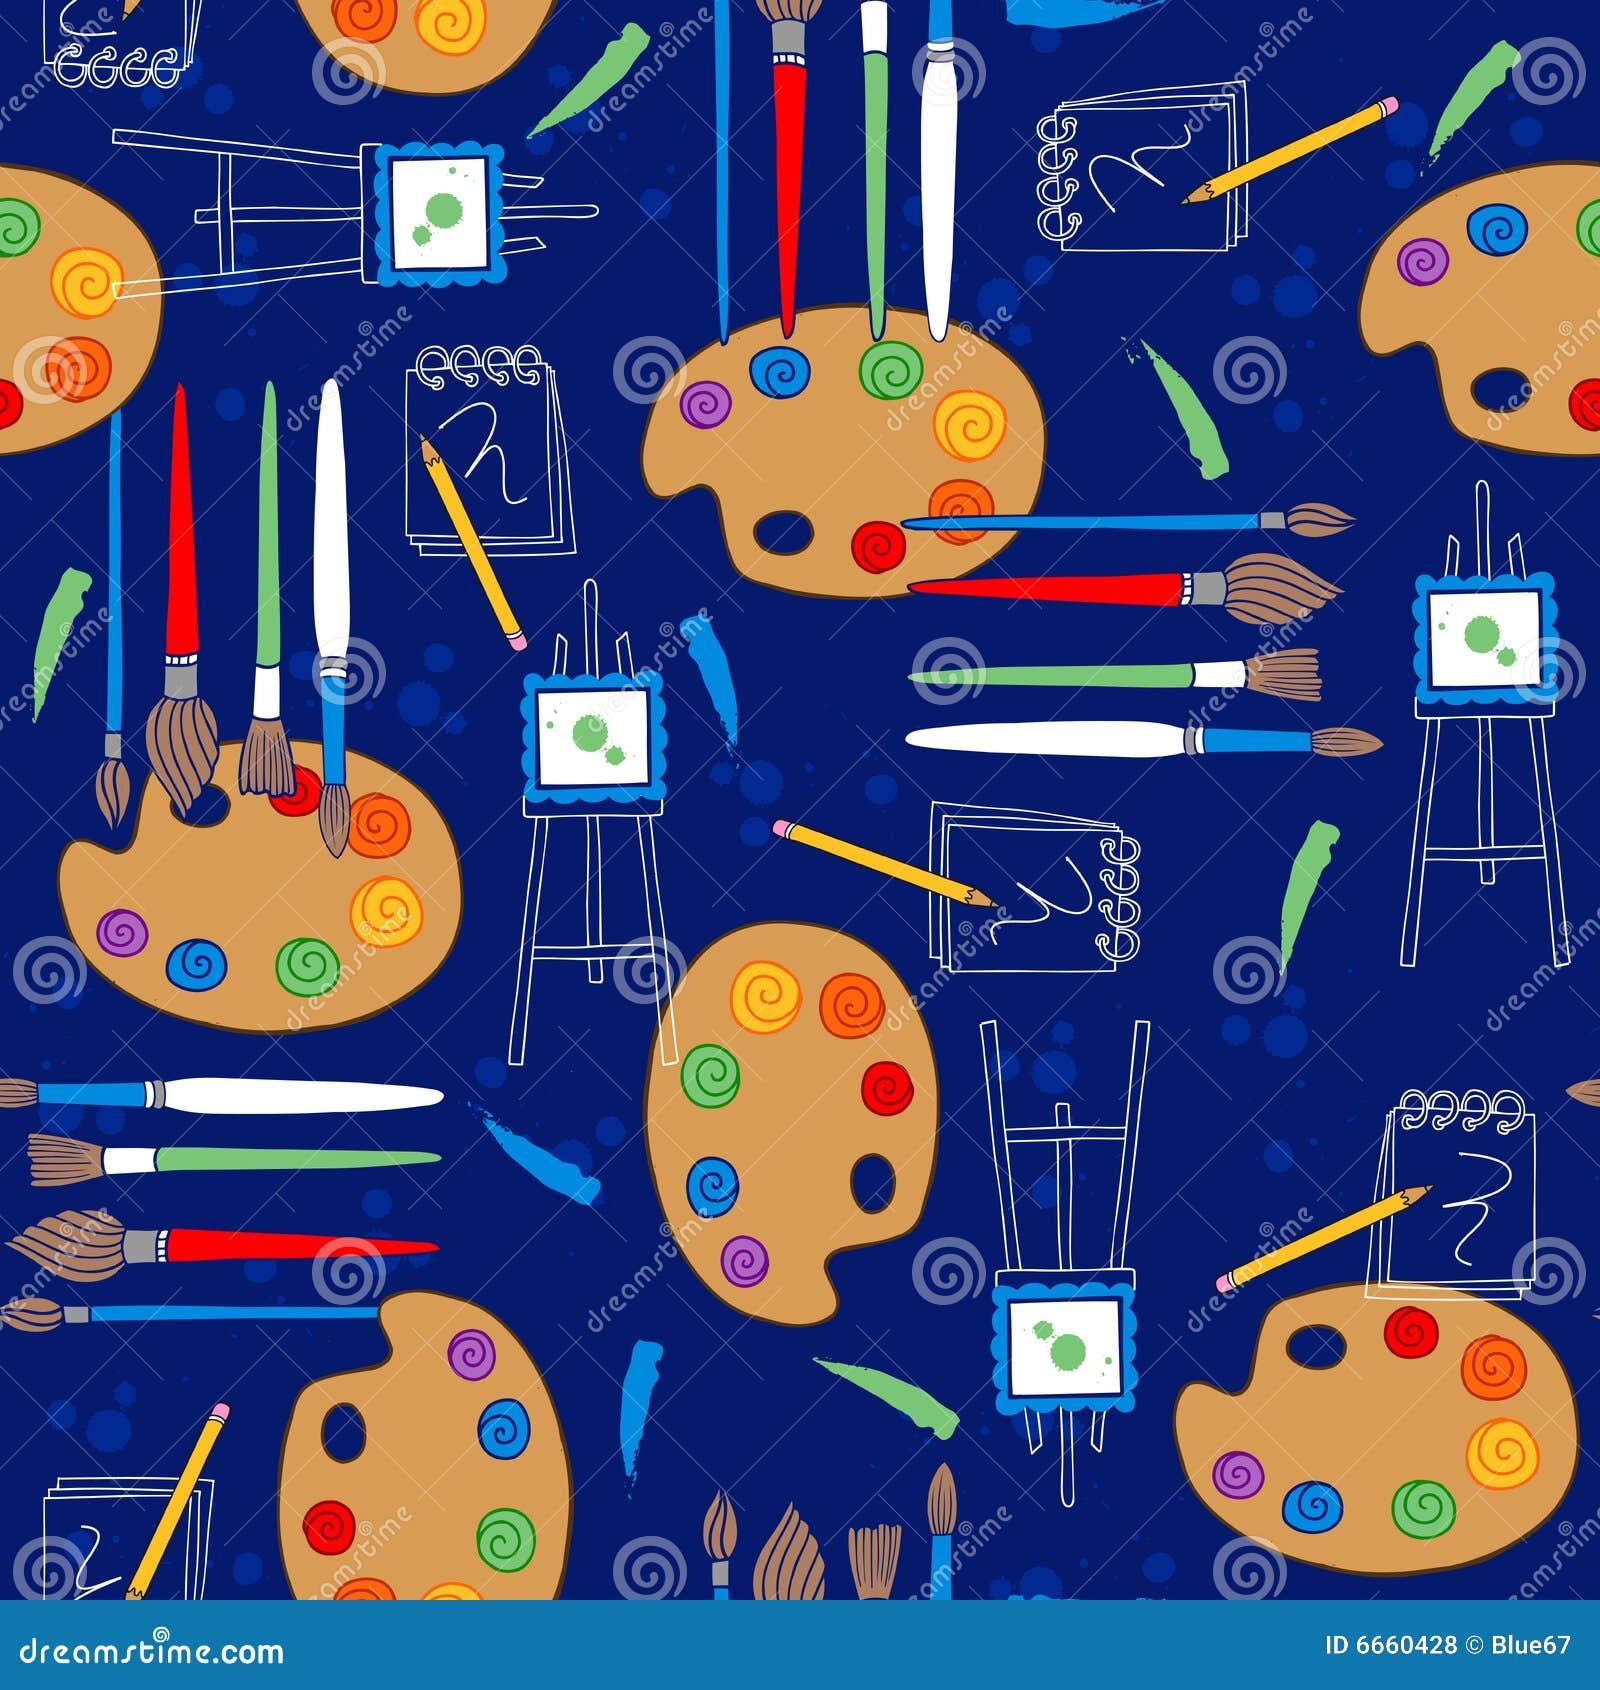 Art Supplies Seamless Repeat Pattern Stock Vector - Illustration of